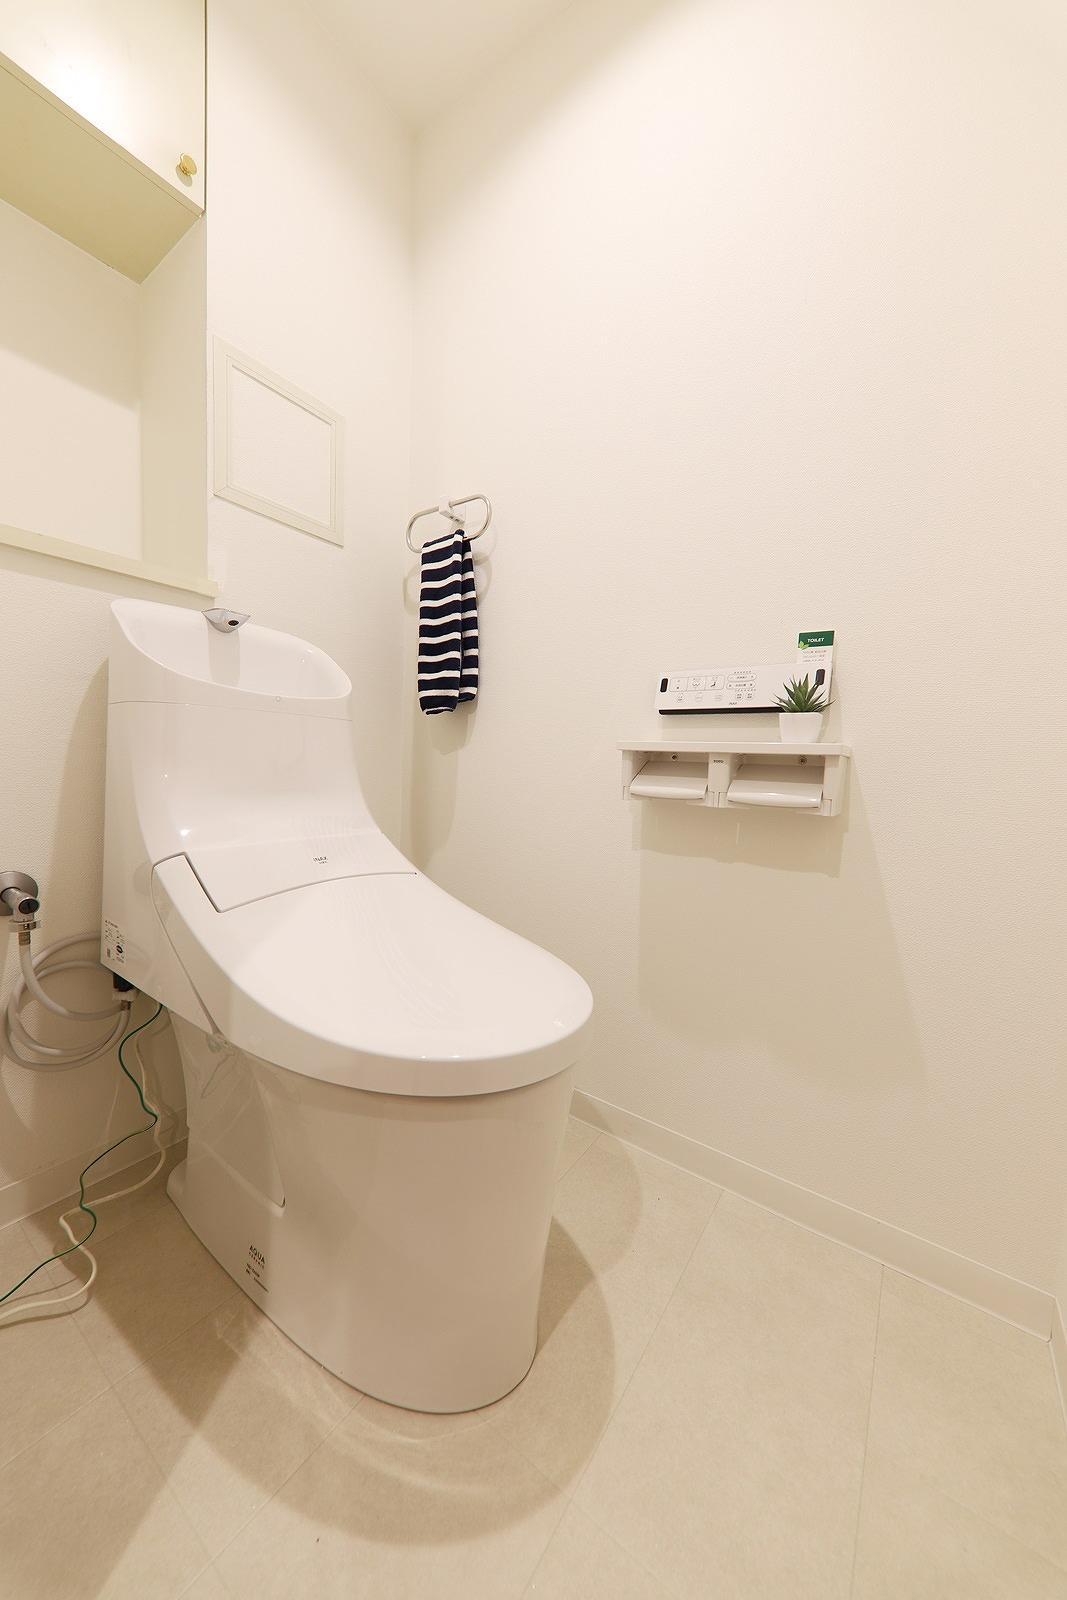 TOTOウォシュレット一体型トイレ新品交換